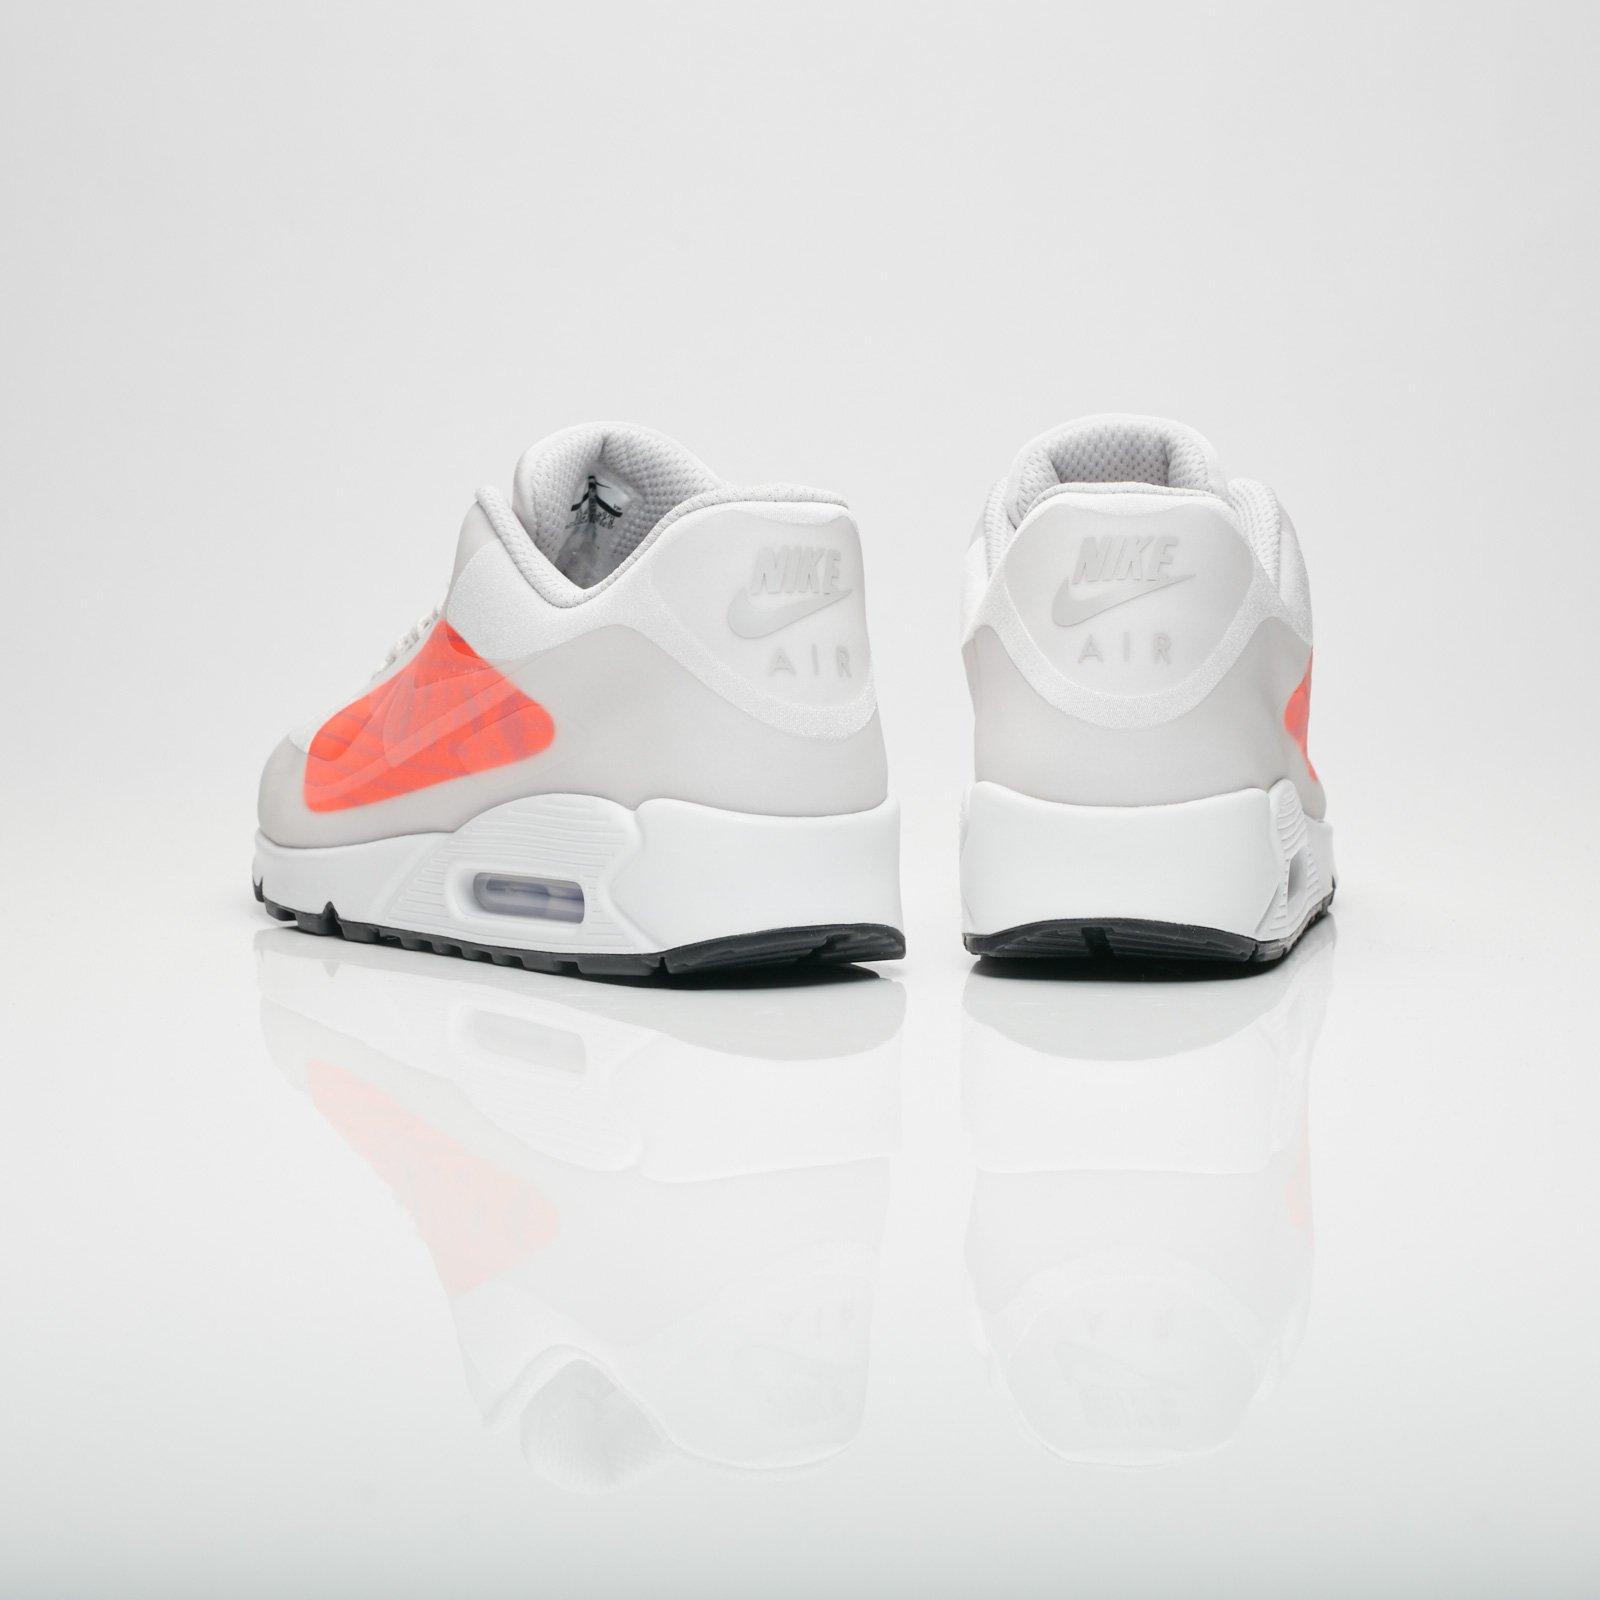 ed2bbdba55bec9 Nike Air Max 90 NS GPX - Aj7182-001 - Sneakersnstuff